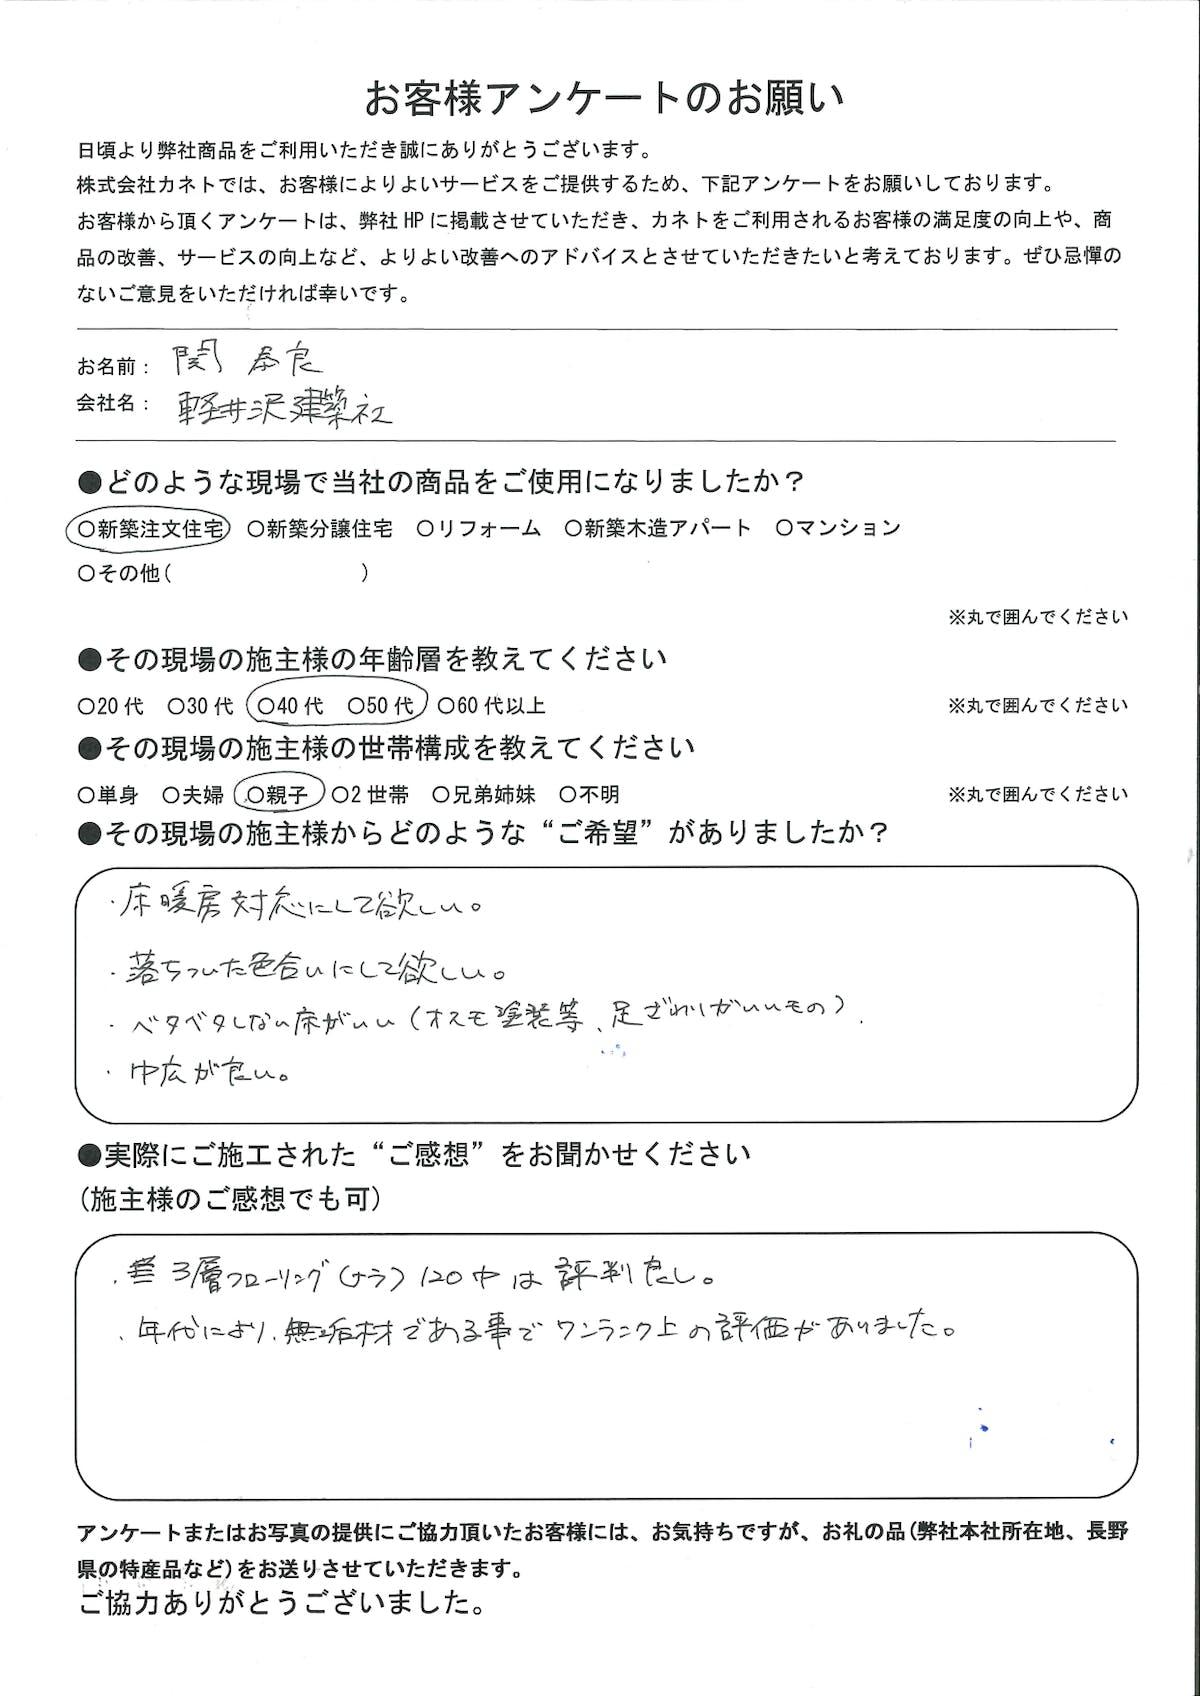 長野県 株式会社参創ハウテック【軽井沢建築社】 関 泰良様